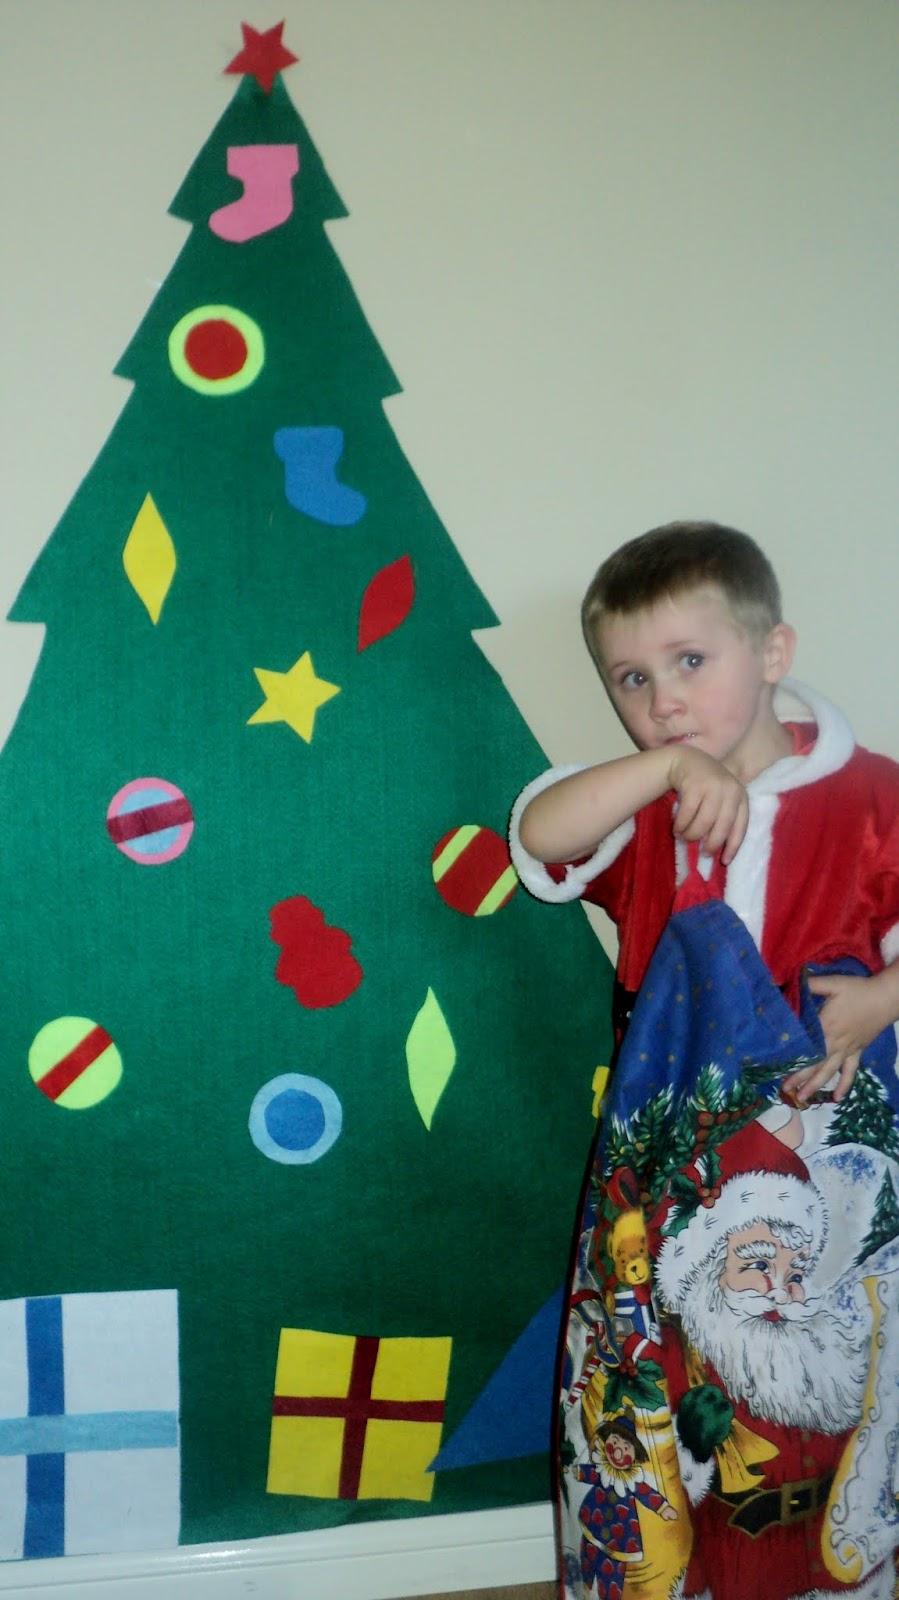 adventures at home with mum felt recreatable christmas tree